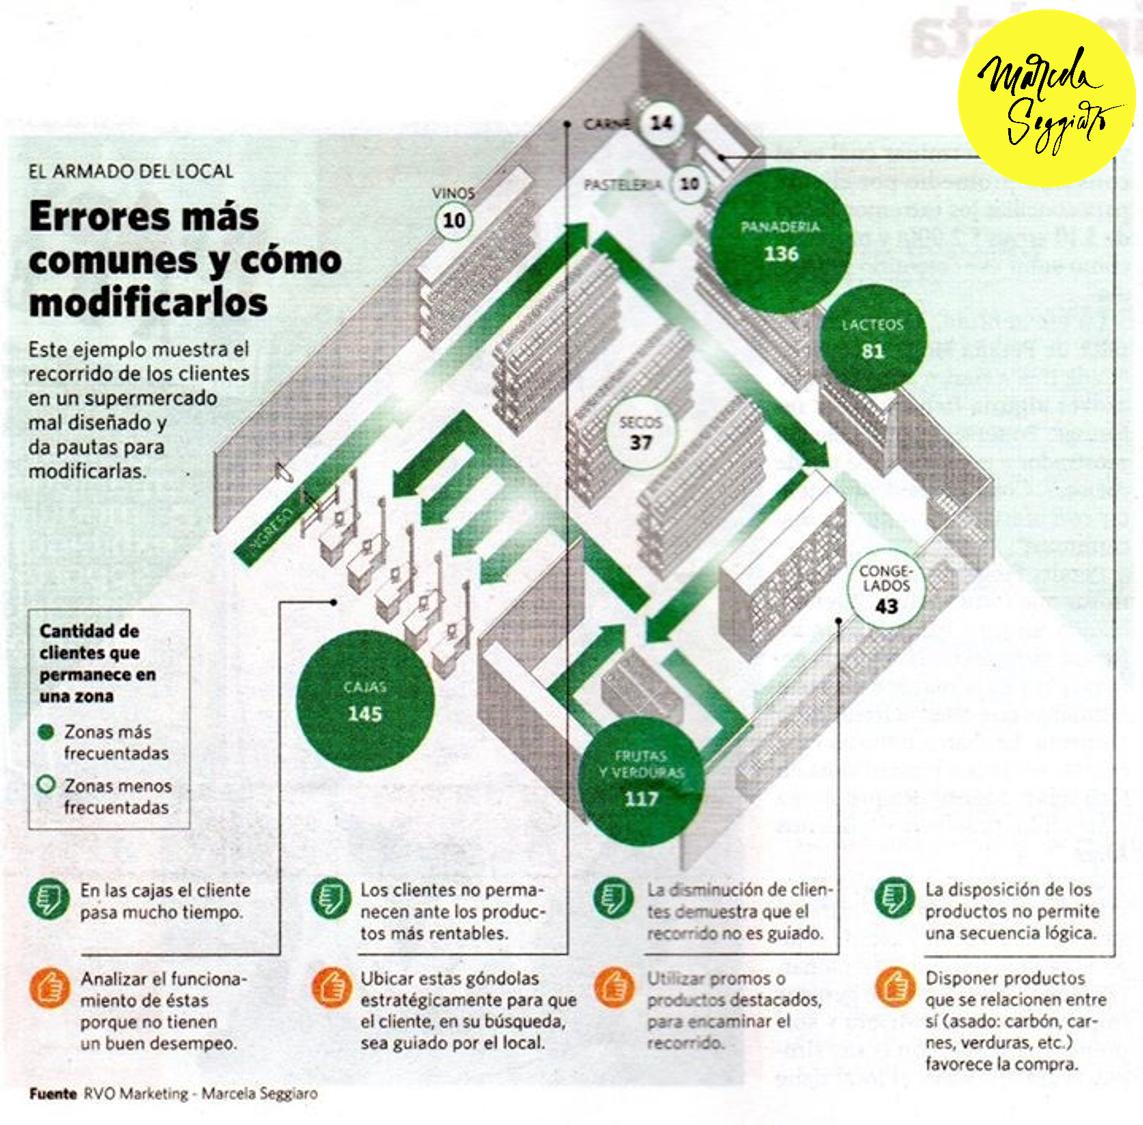 Tendencias Retail. El futuro del Visual Merchandising. Macro layout. Marcela Seggiaro